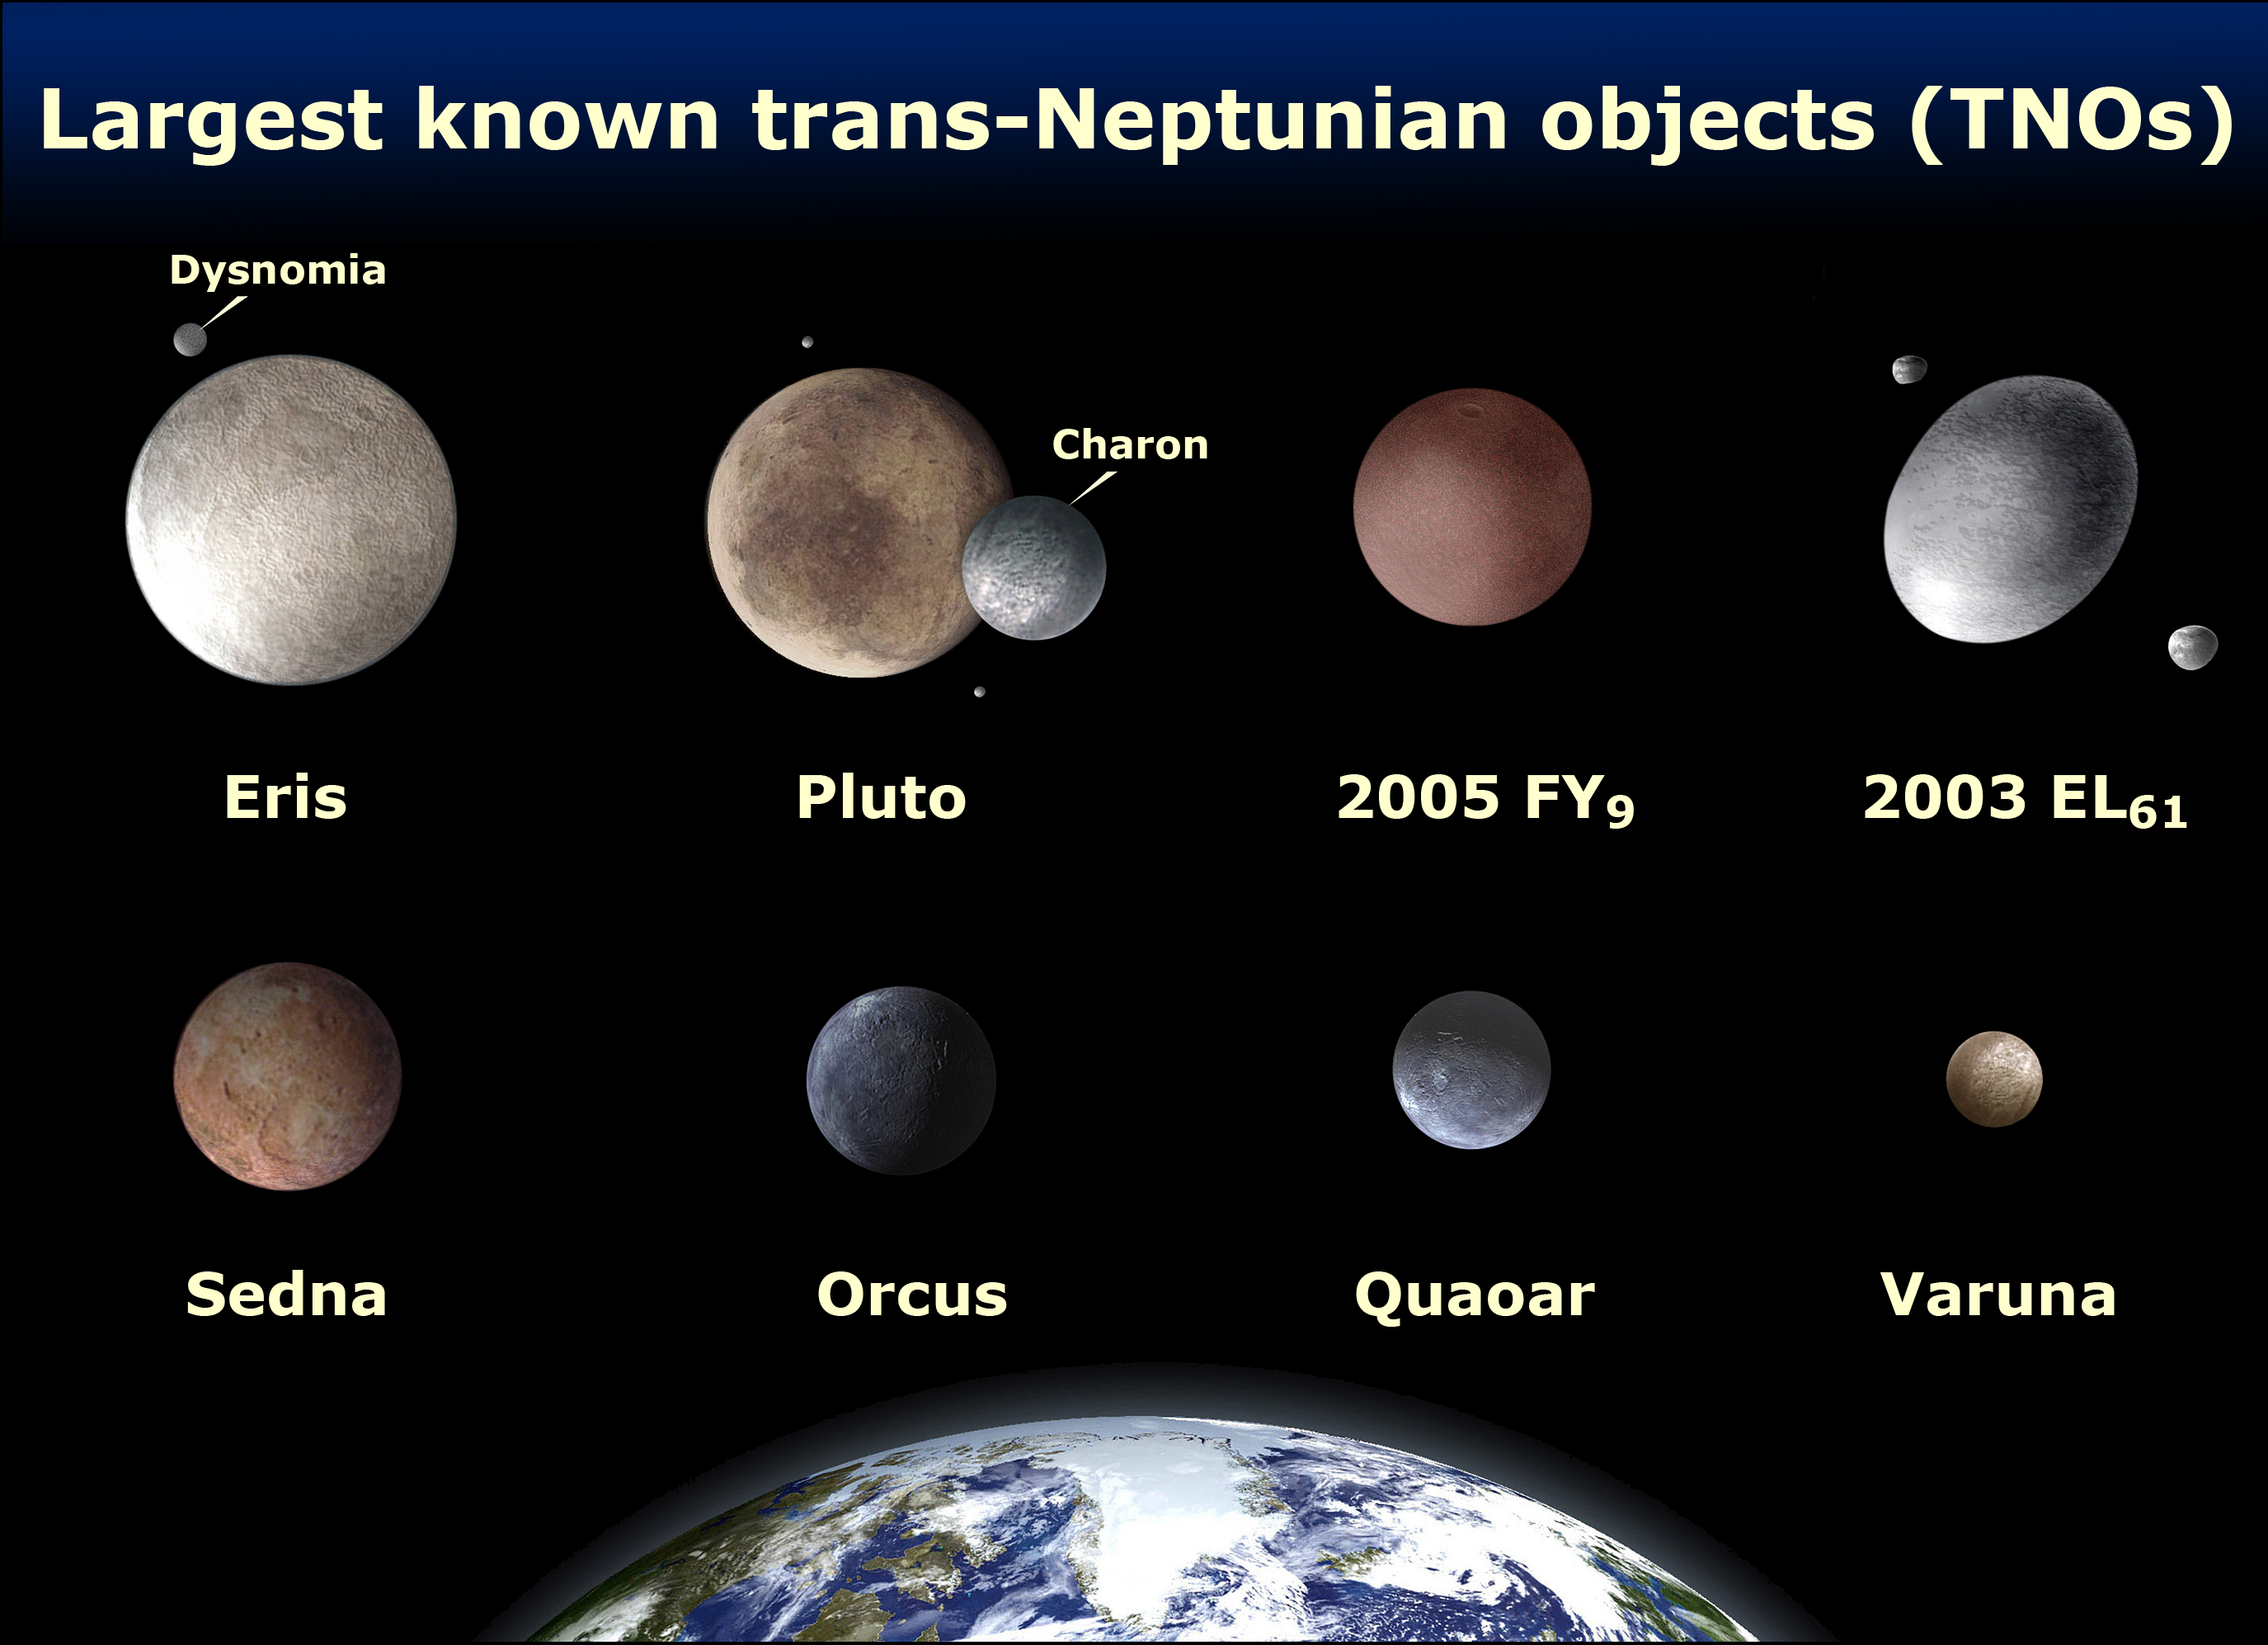 Eris: More Massive than Pluto